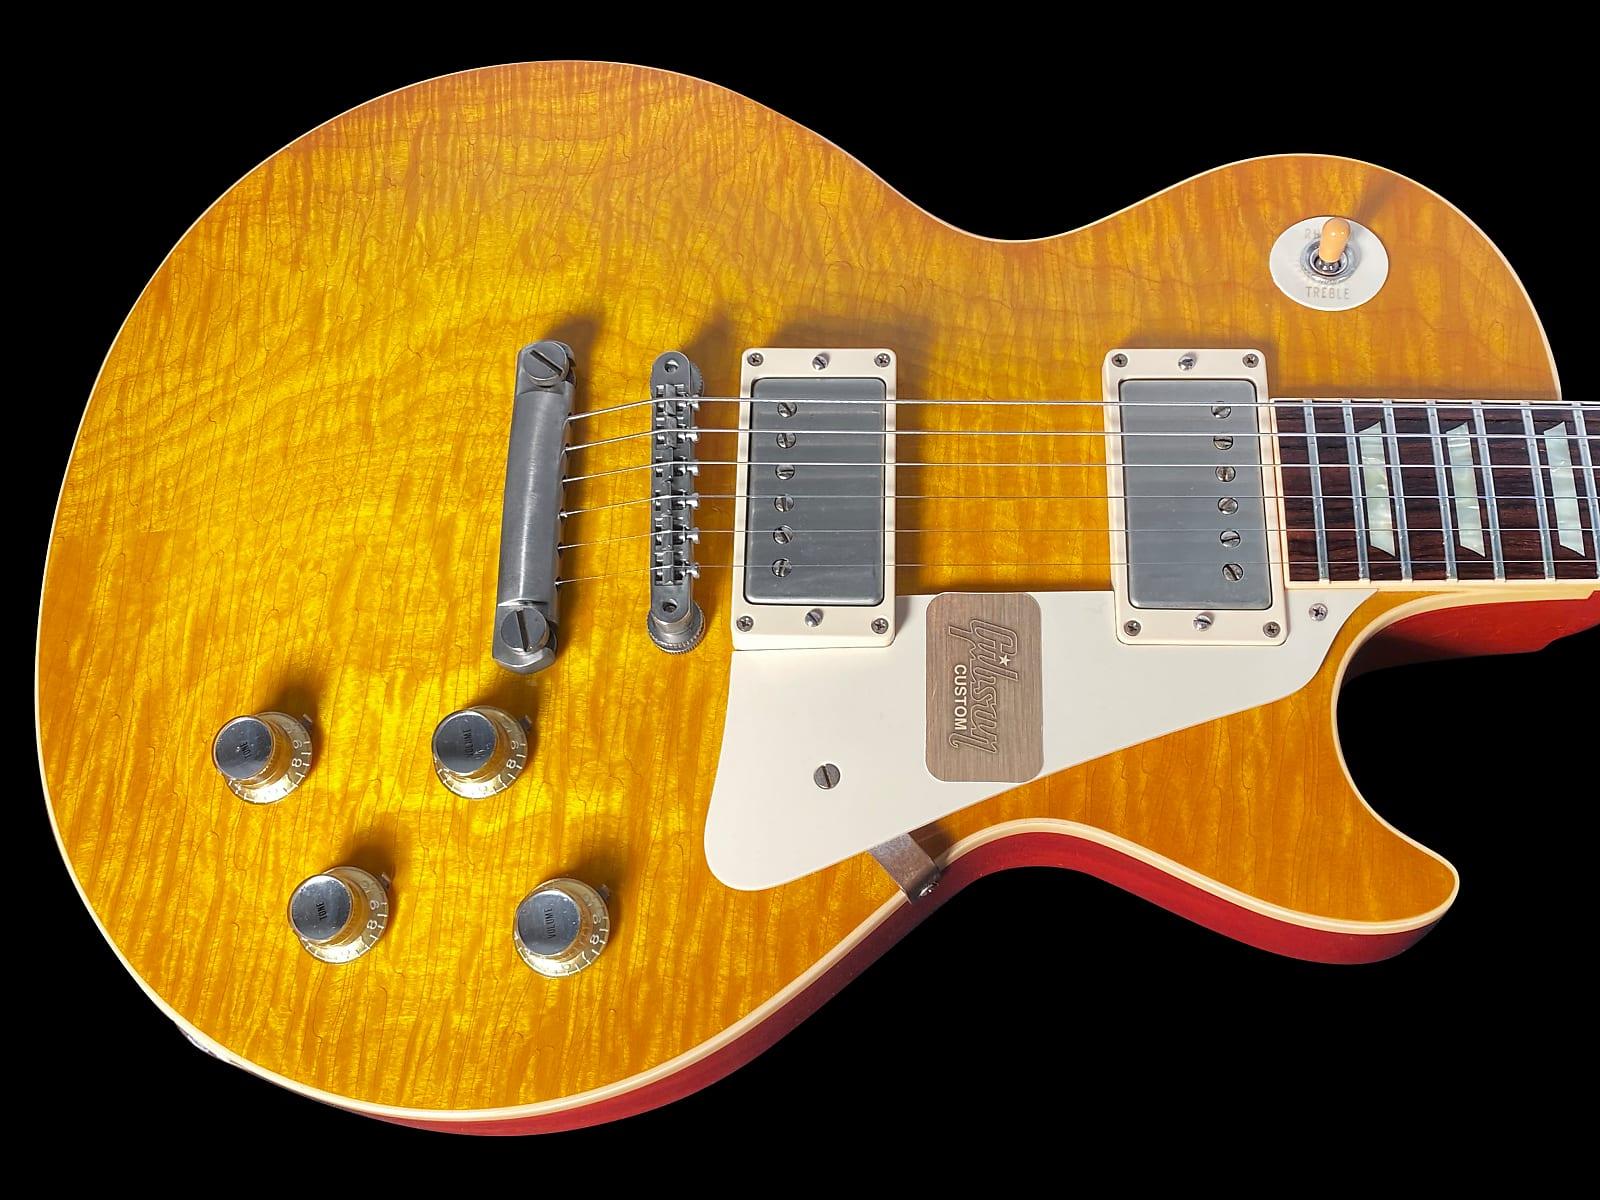 2012 Gibson Les Paul 1960 Historic 60 Custom Shop R0 Murphy Aged with Madagascar Rosewood Board ~ Lemon Burst